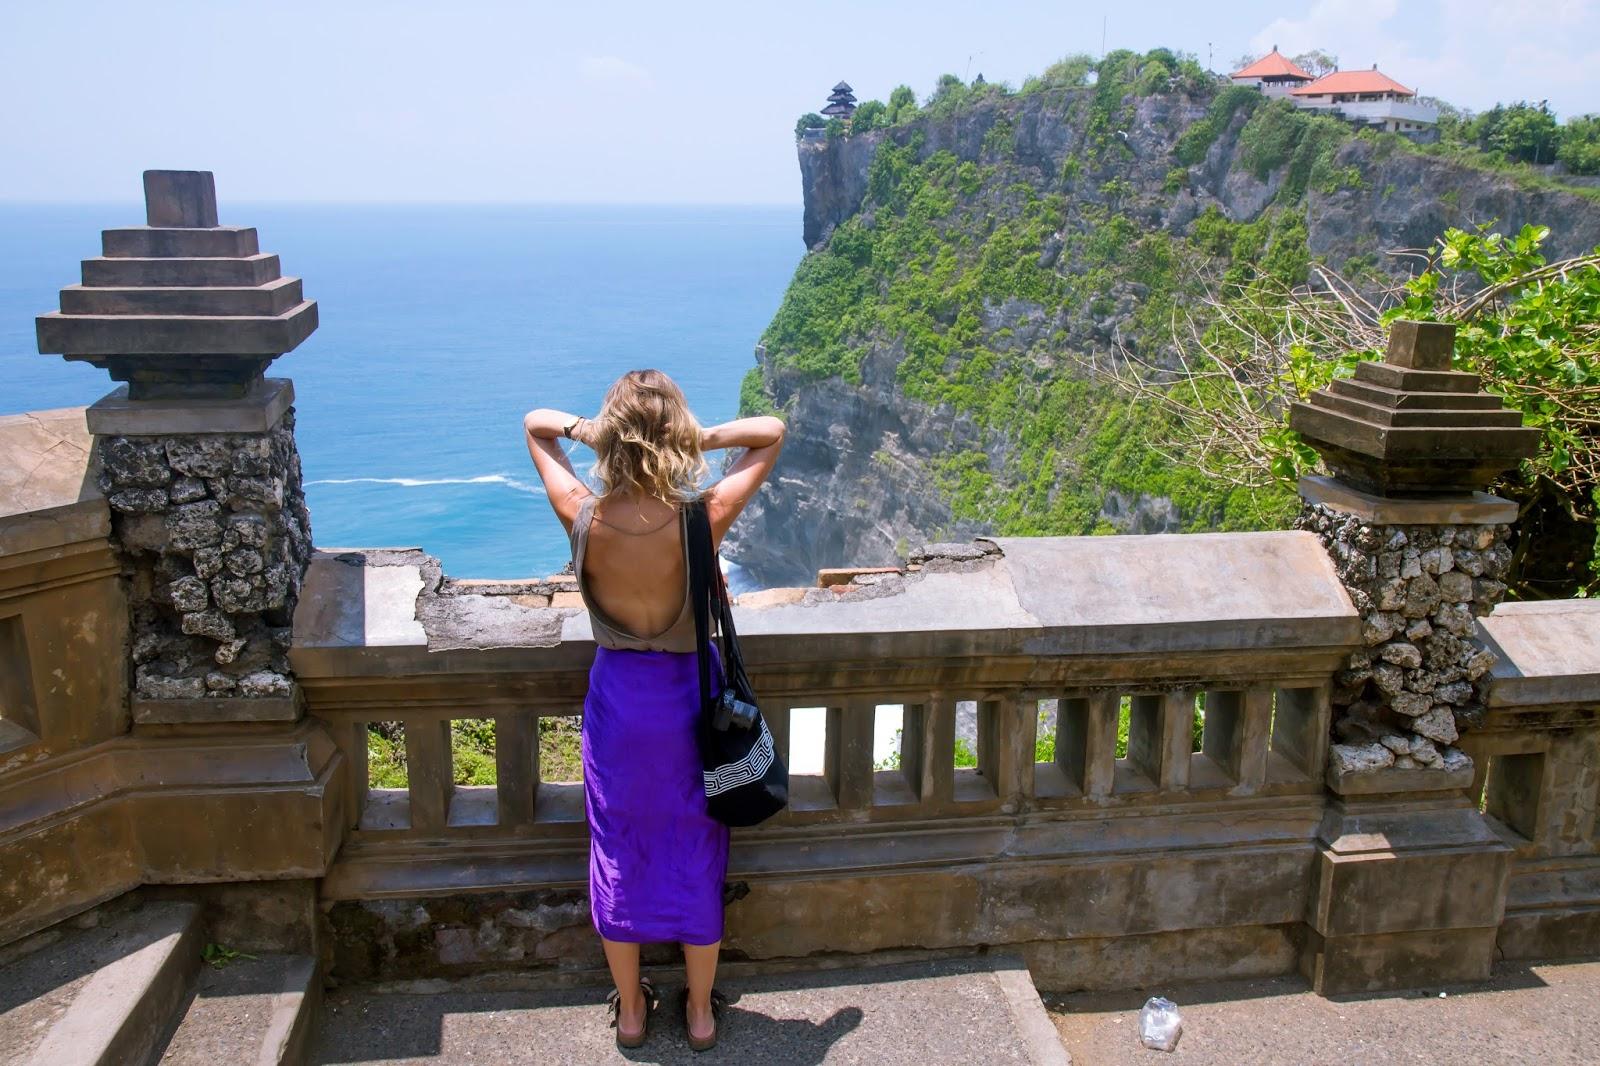 travel blogger, Alison Hutchinson, at Uluwatu Temple in Bali, Indonesia